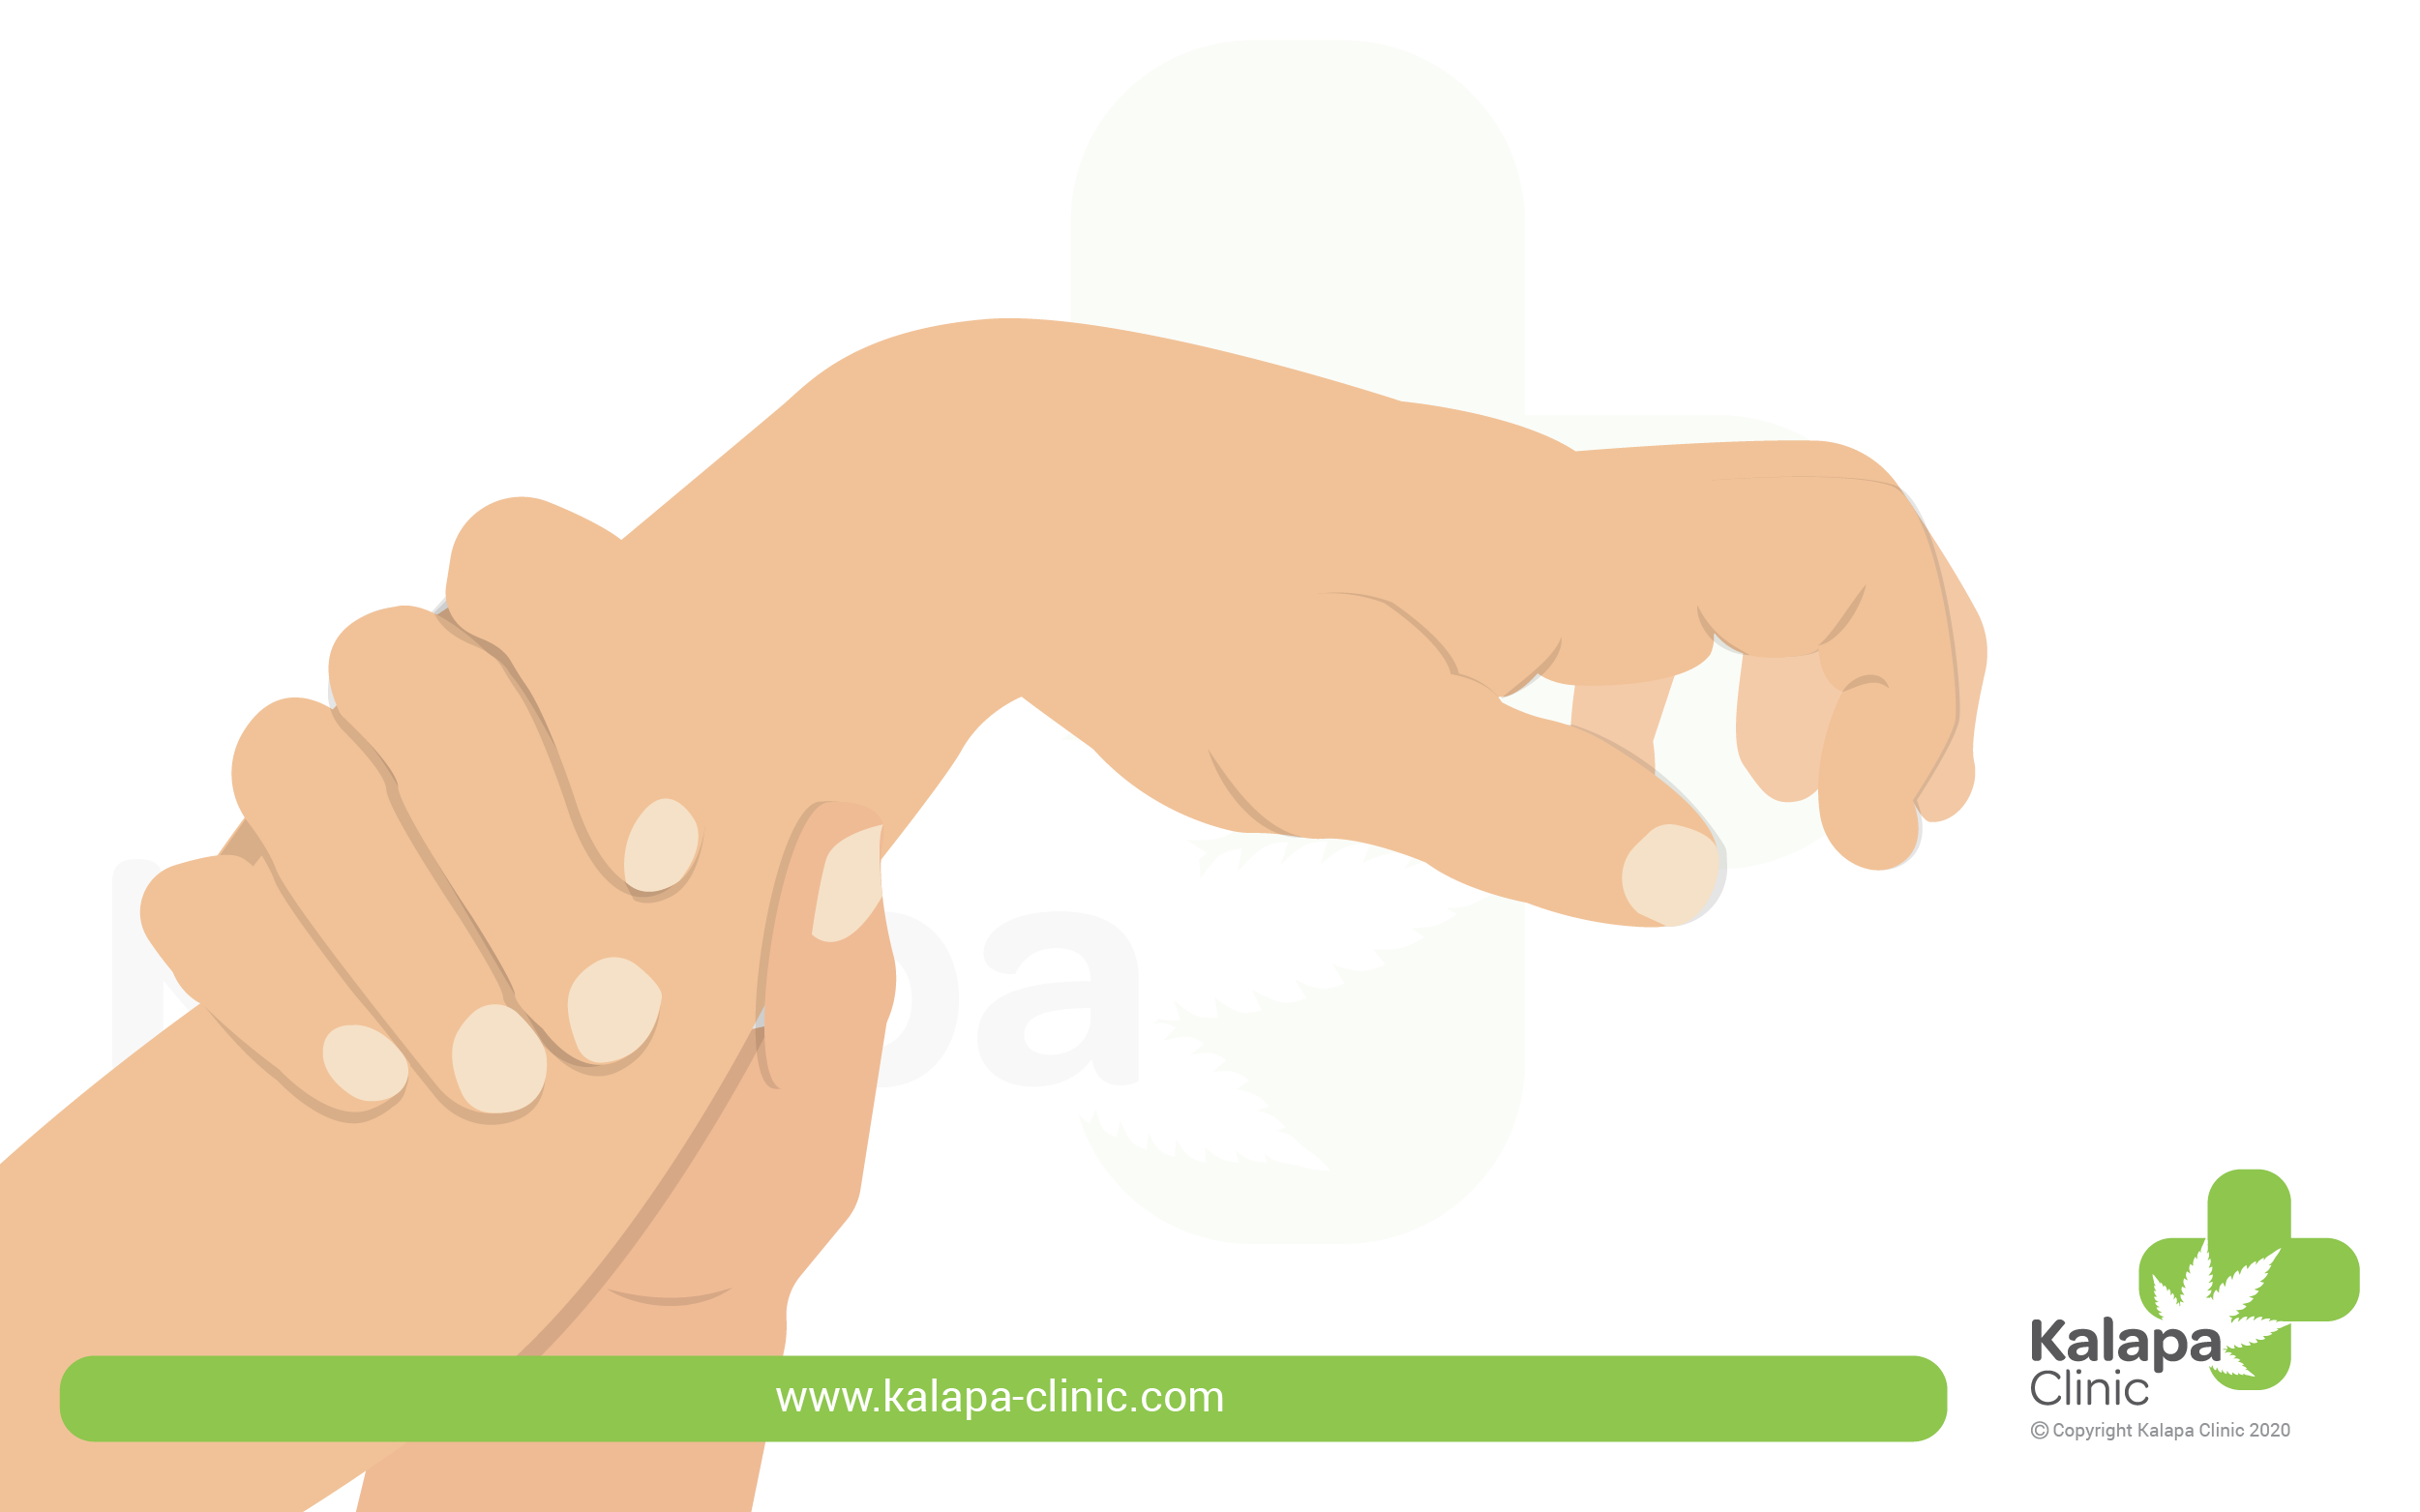 Spastizität und medizinisches Cannabis | Kalapa Clinic